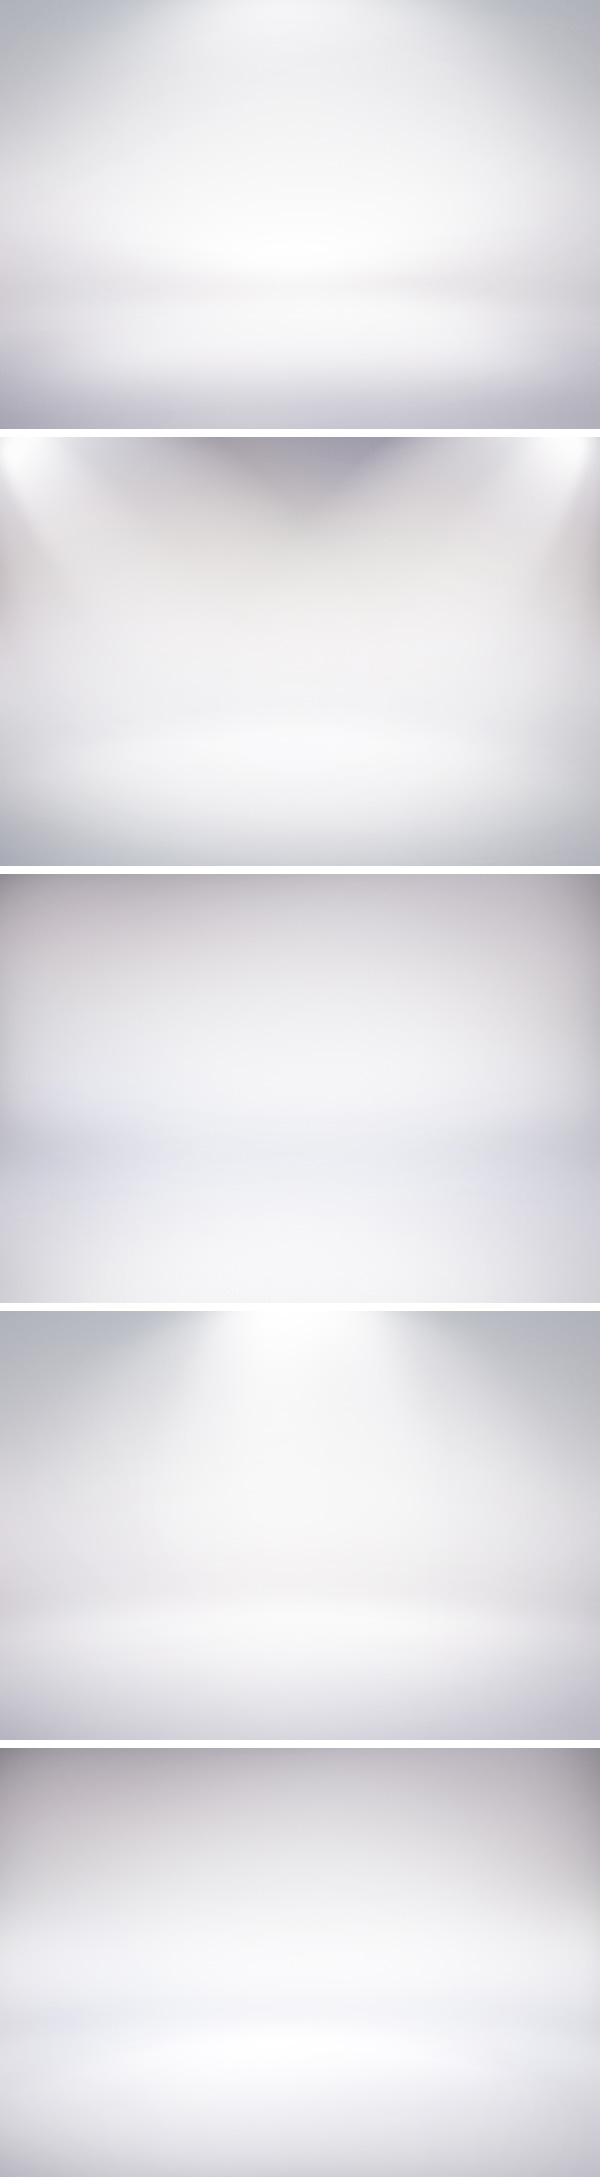 5 Infinite White Studio Backdrops | GraphicBurger